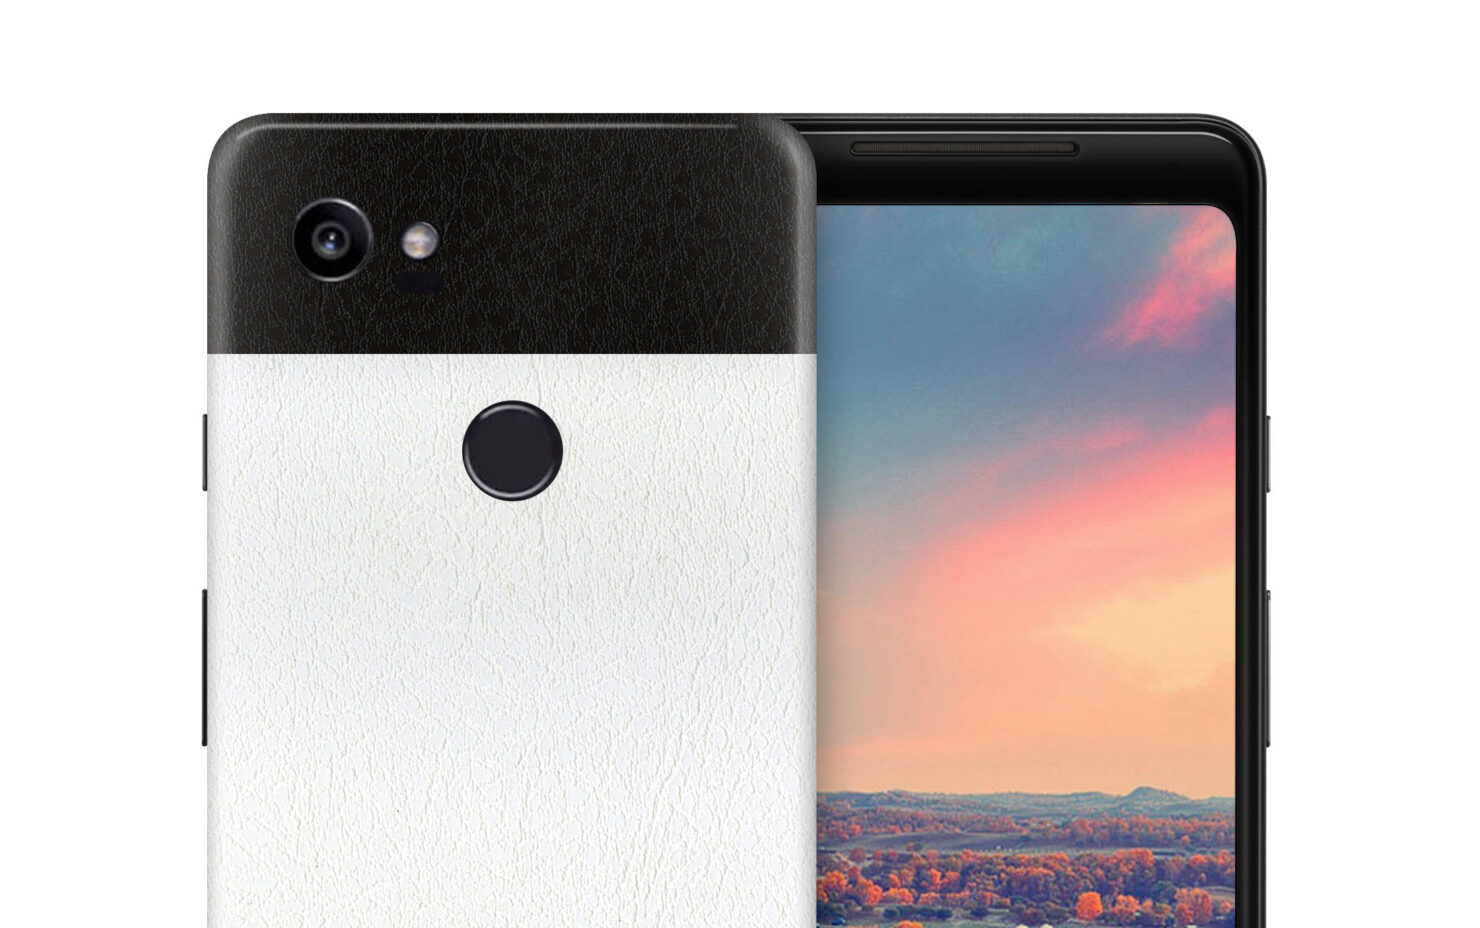 Google Pixel 3 XL Chinese benchmark leak 4GB RAM